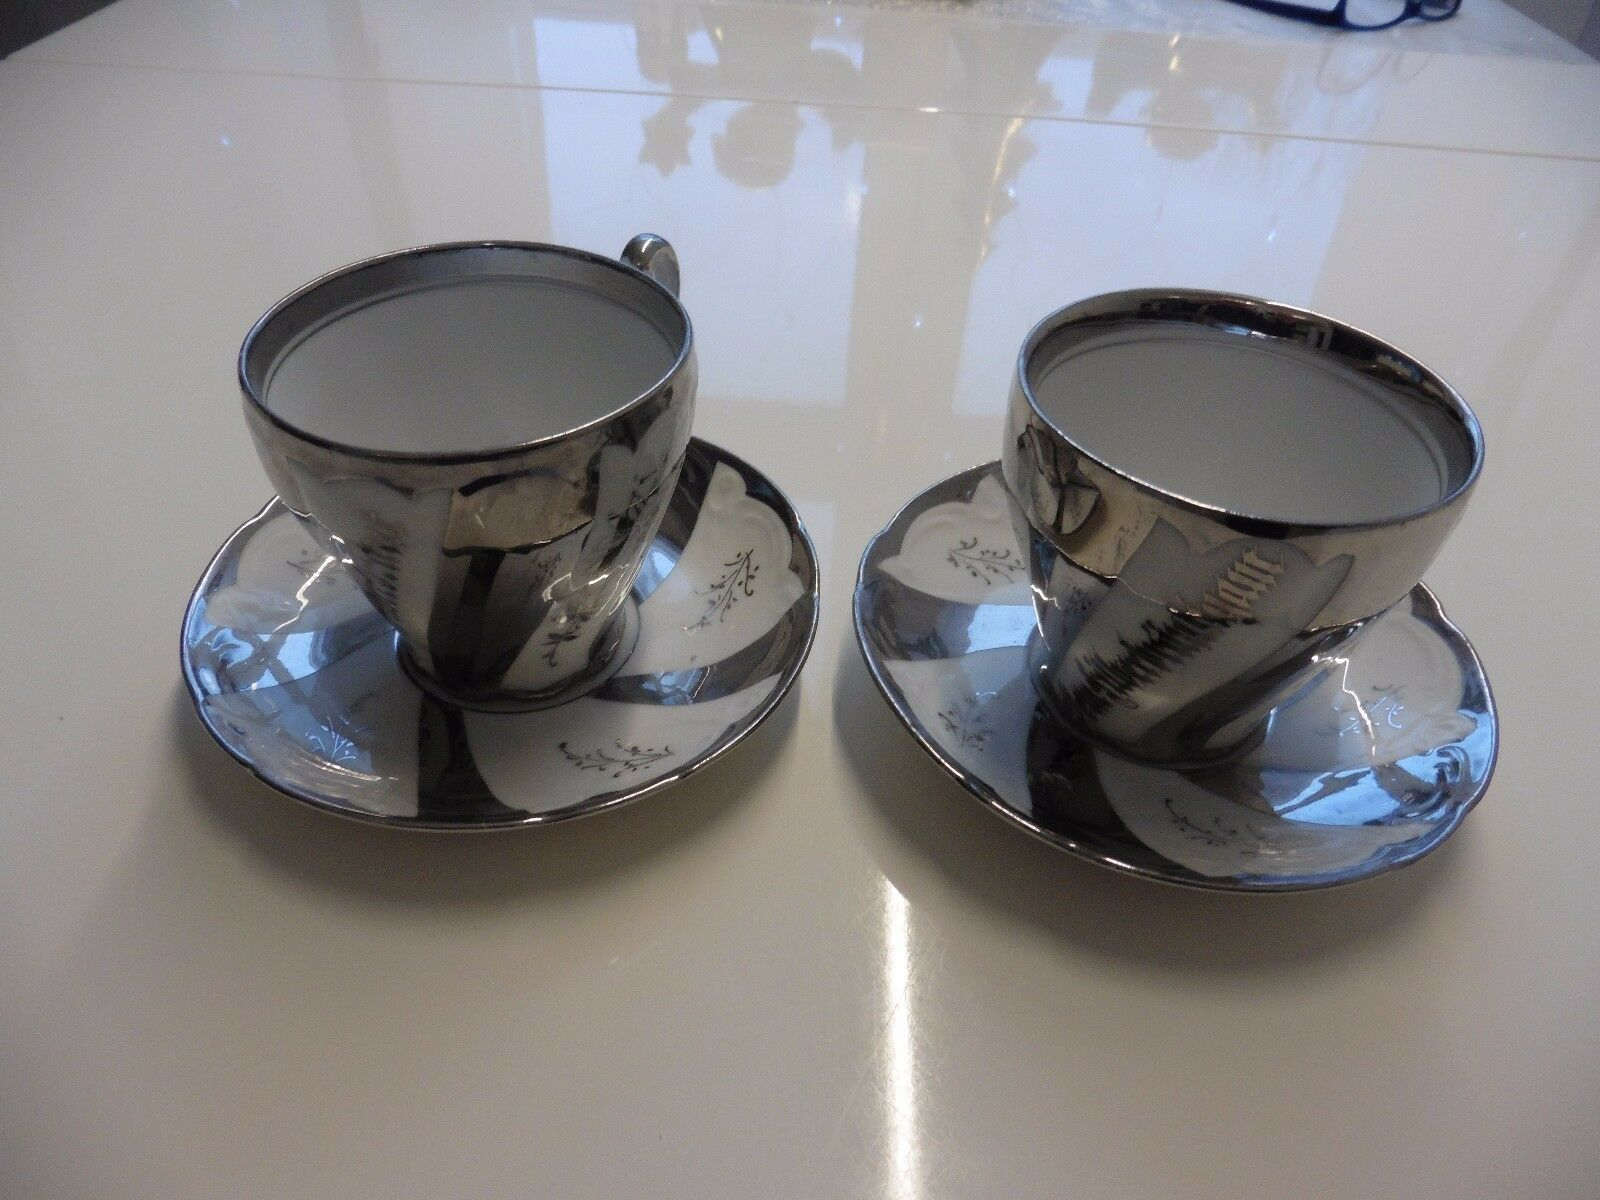 Antik Krister KPM 1 Tasse  Der Silberbraut, Silberbraut, Silberbraut, 1 Tasse Dem Silberbräutigam+Untert.   New Products  31ba81